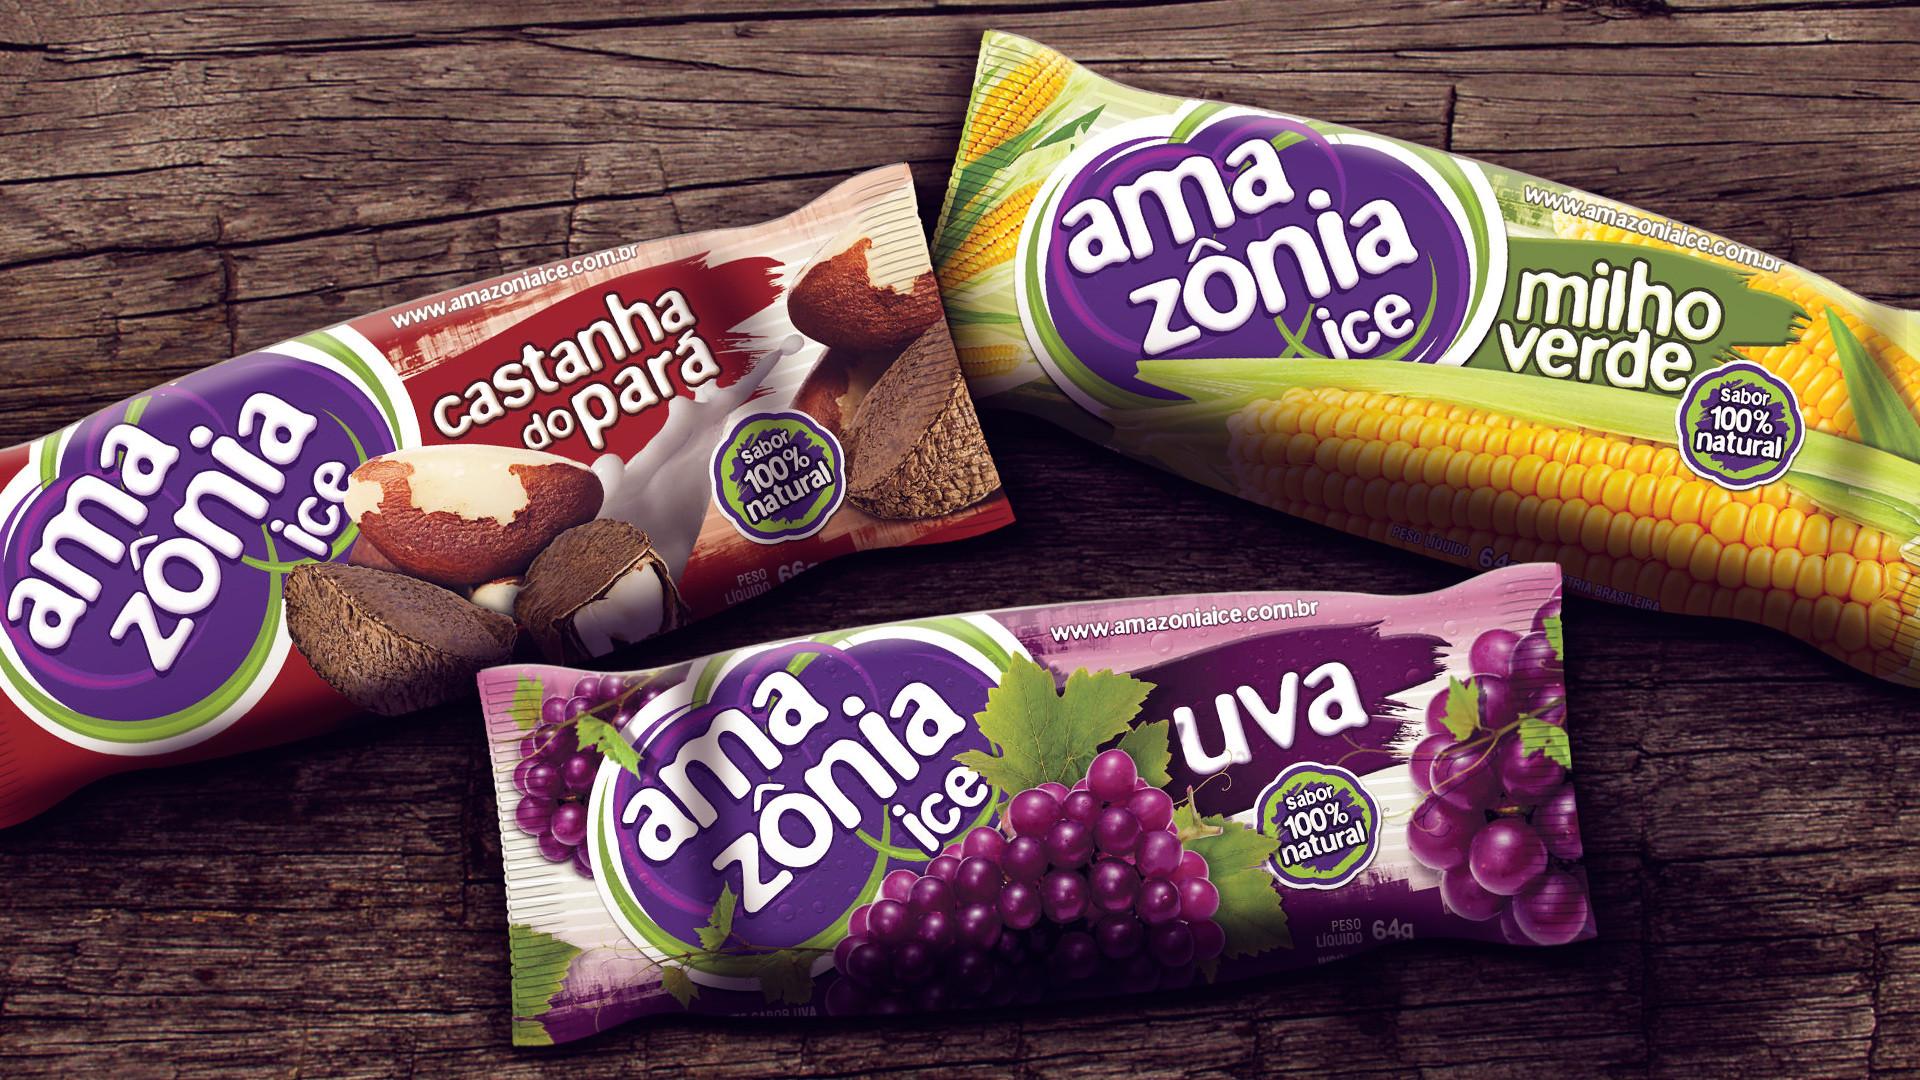 maior_de_todas_portfolio_amazonia_ice_03